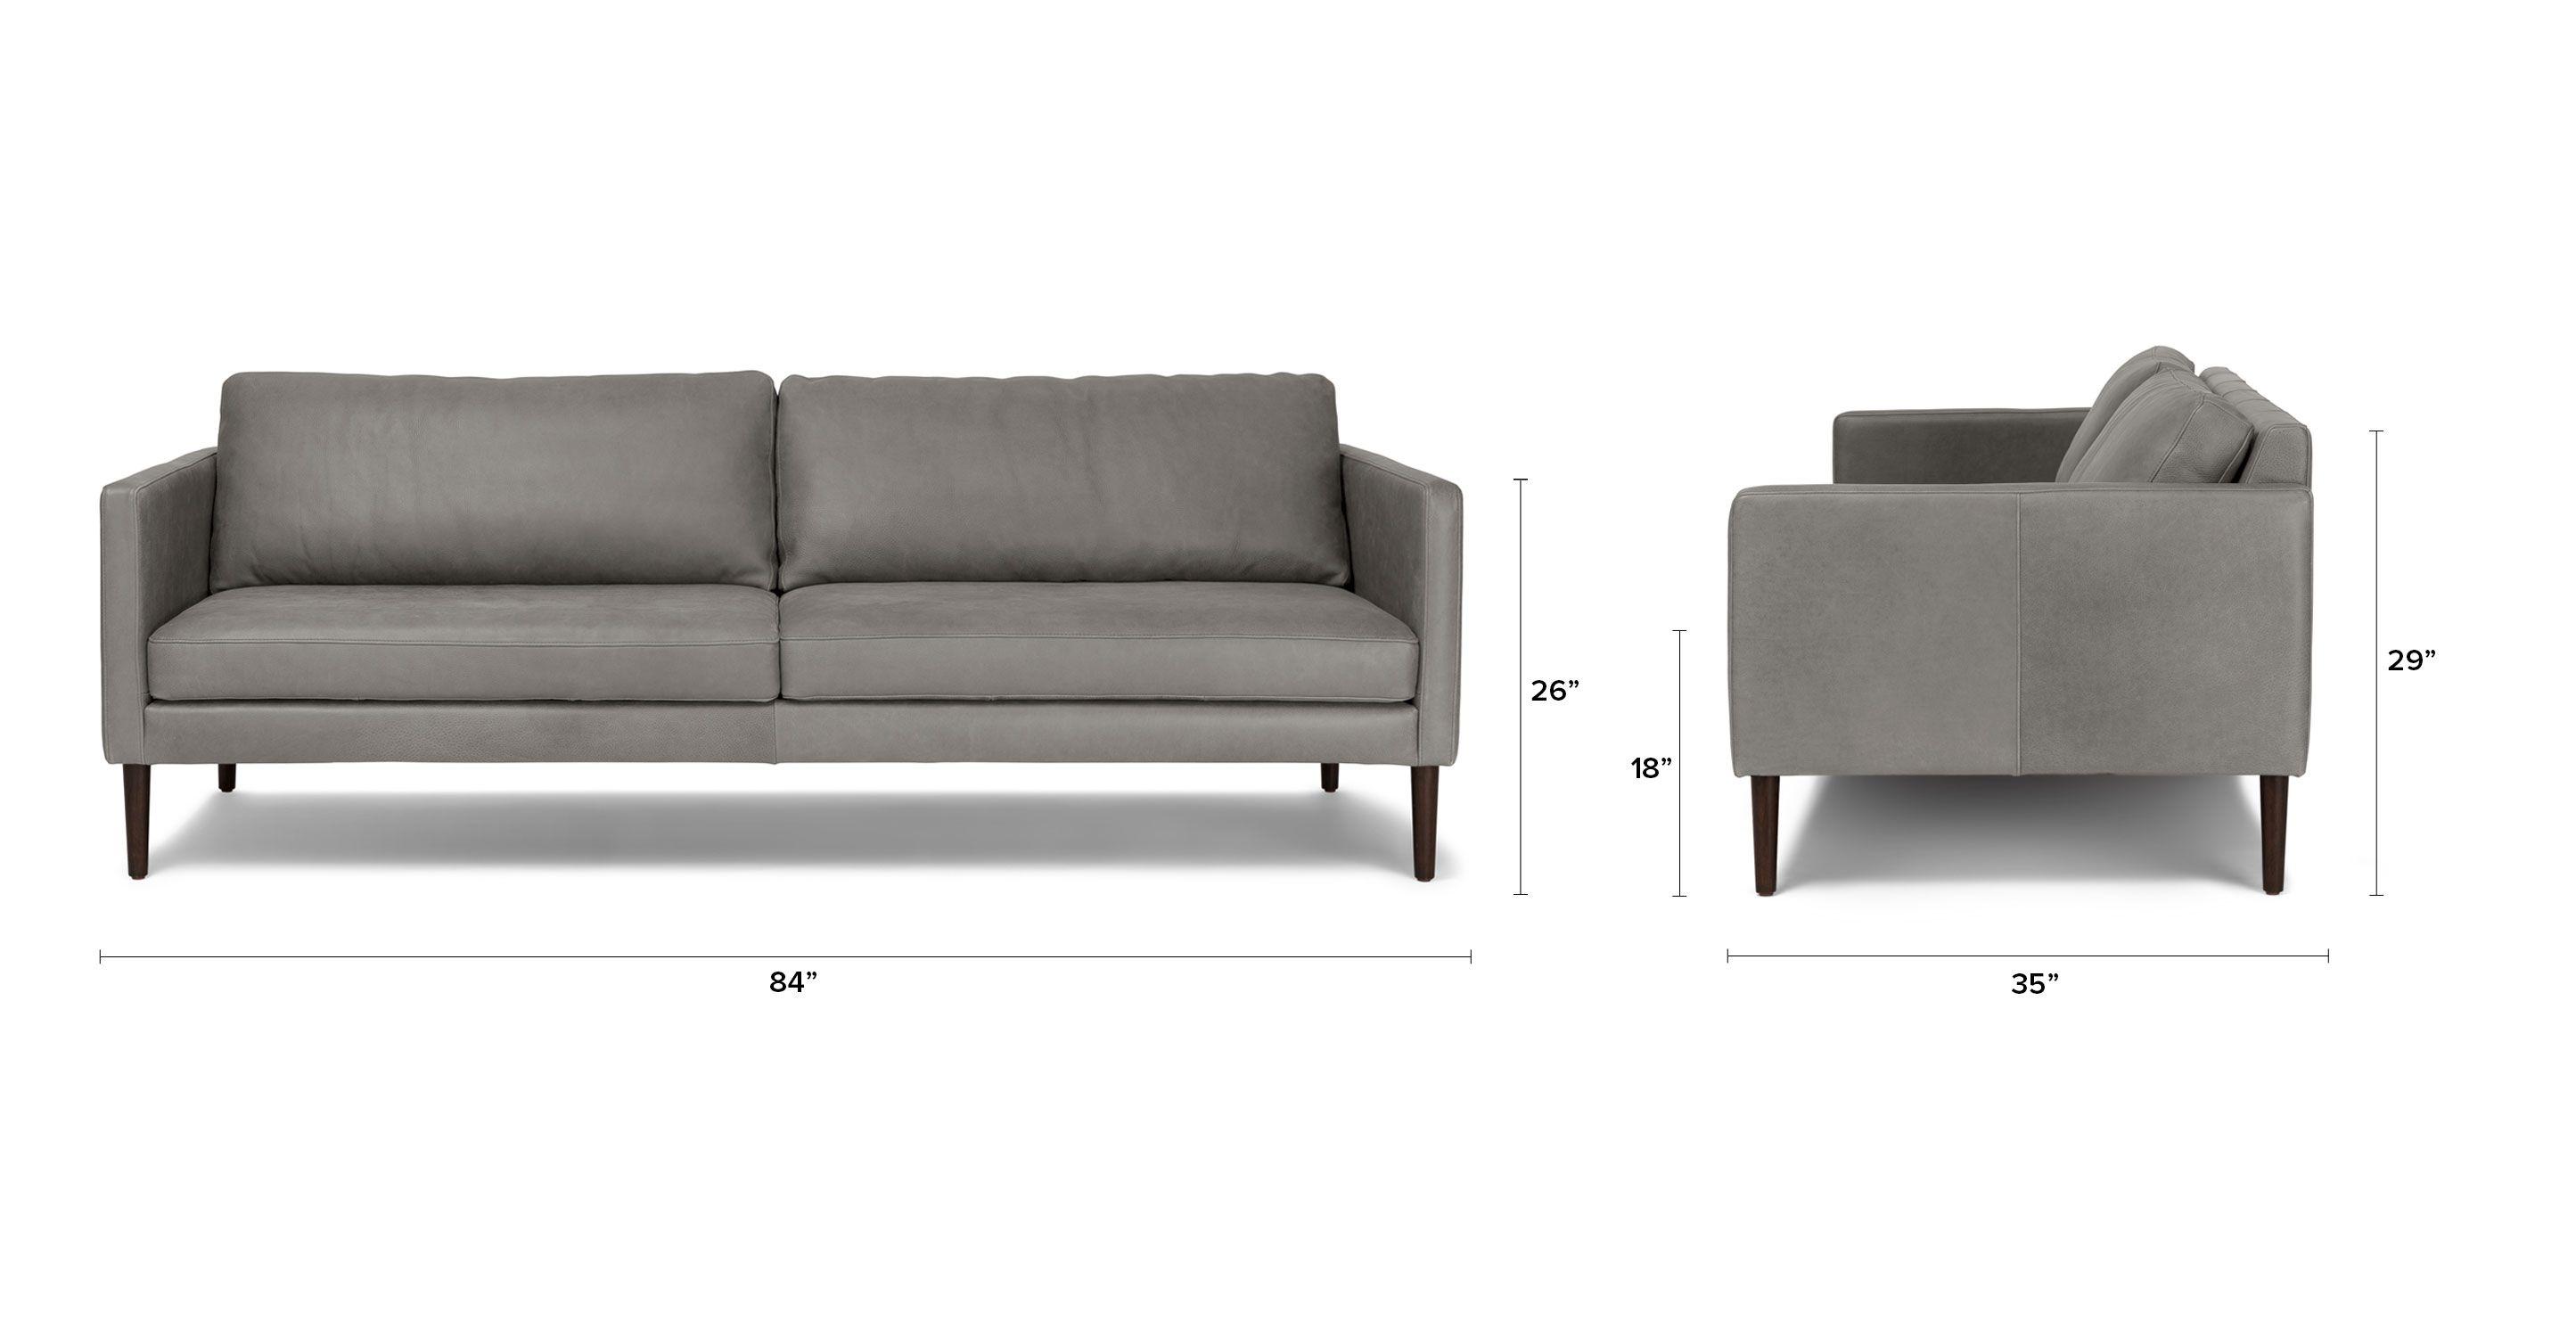 echo primo lichen gray sofa hudson gray sofa sofa living room sofa rh pinterest com